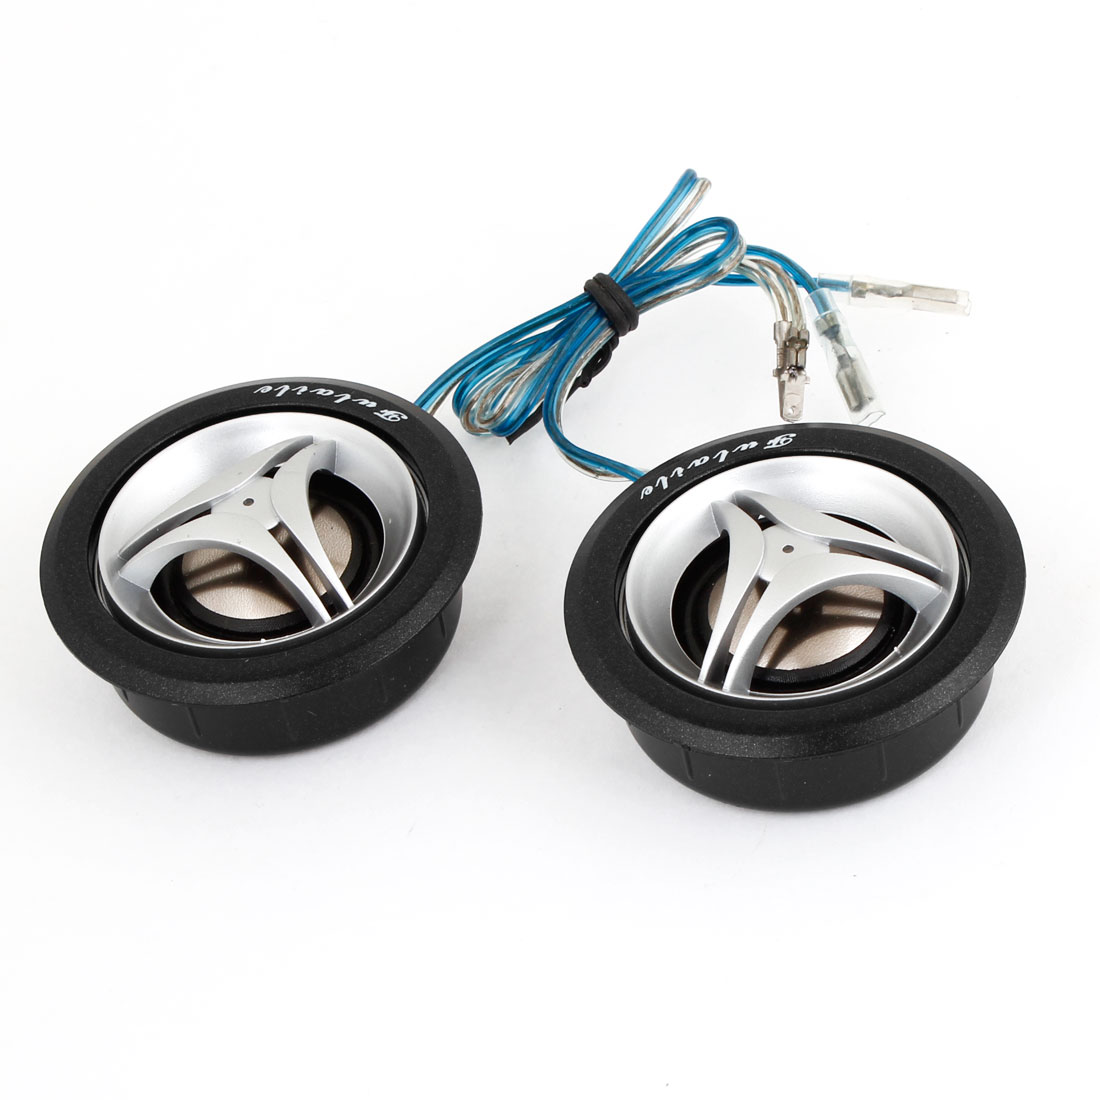 "2.4"" Dome Car Tweeter Speakers Horn Silver Tone Black 2 Pcs"